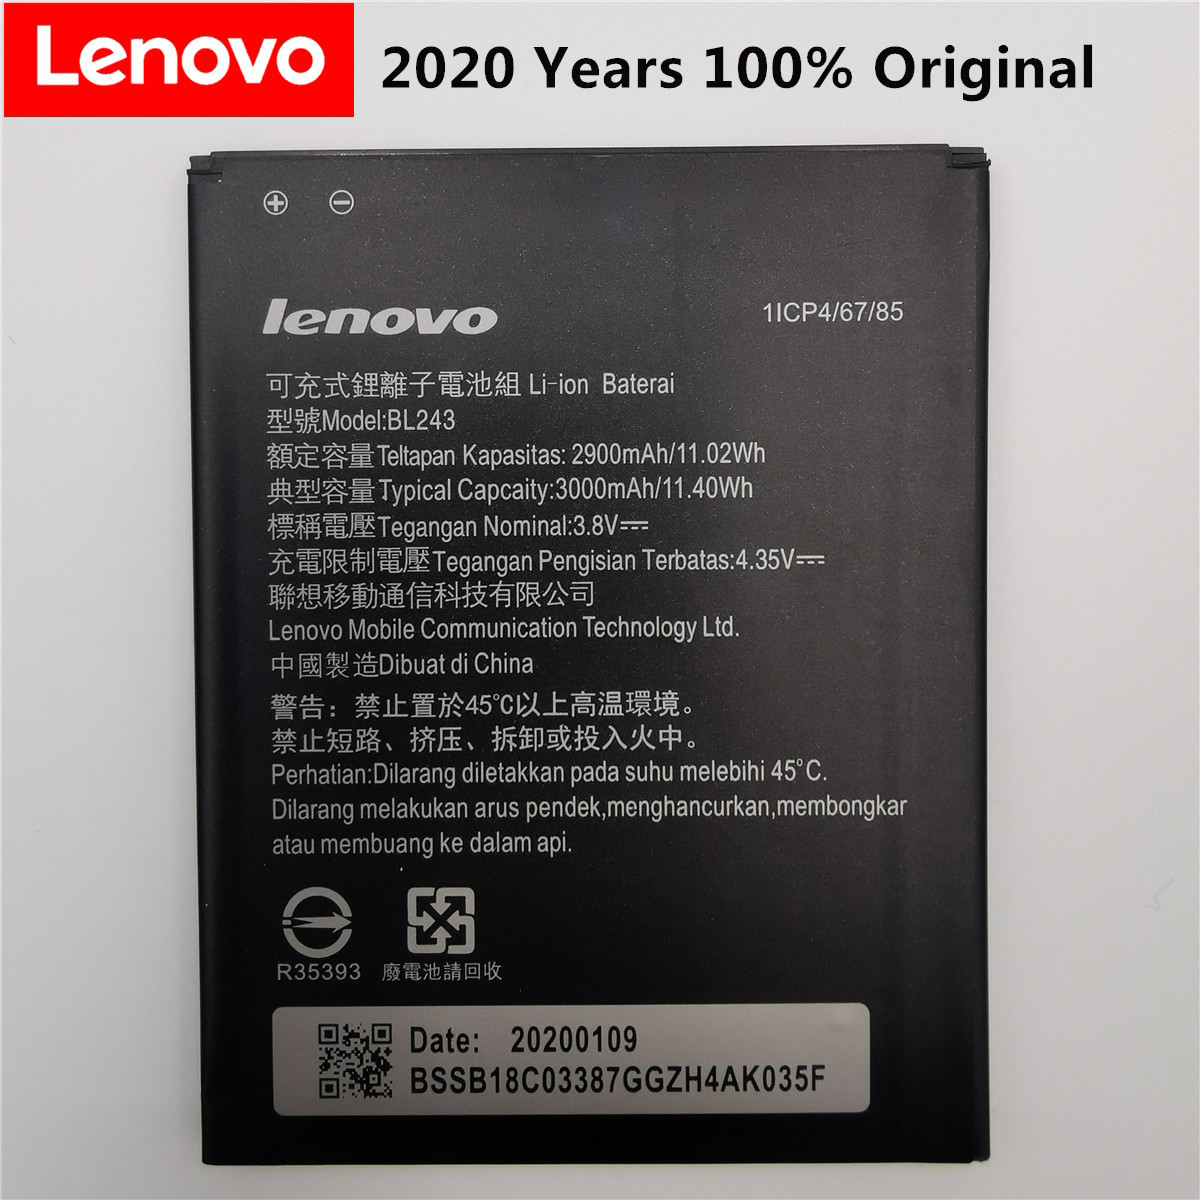 2020 New BL 243 BL243 Battery For Lenovo Lemon K3 Note K50-T5 A7000 A5500 A5600 A7600 2900mAh Mobile Phone Backup Bateria